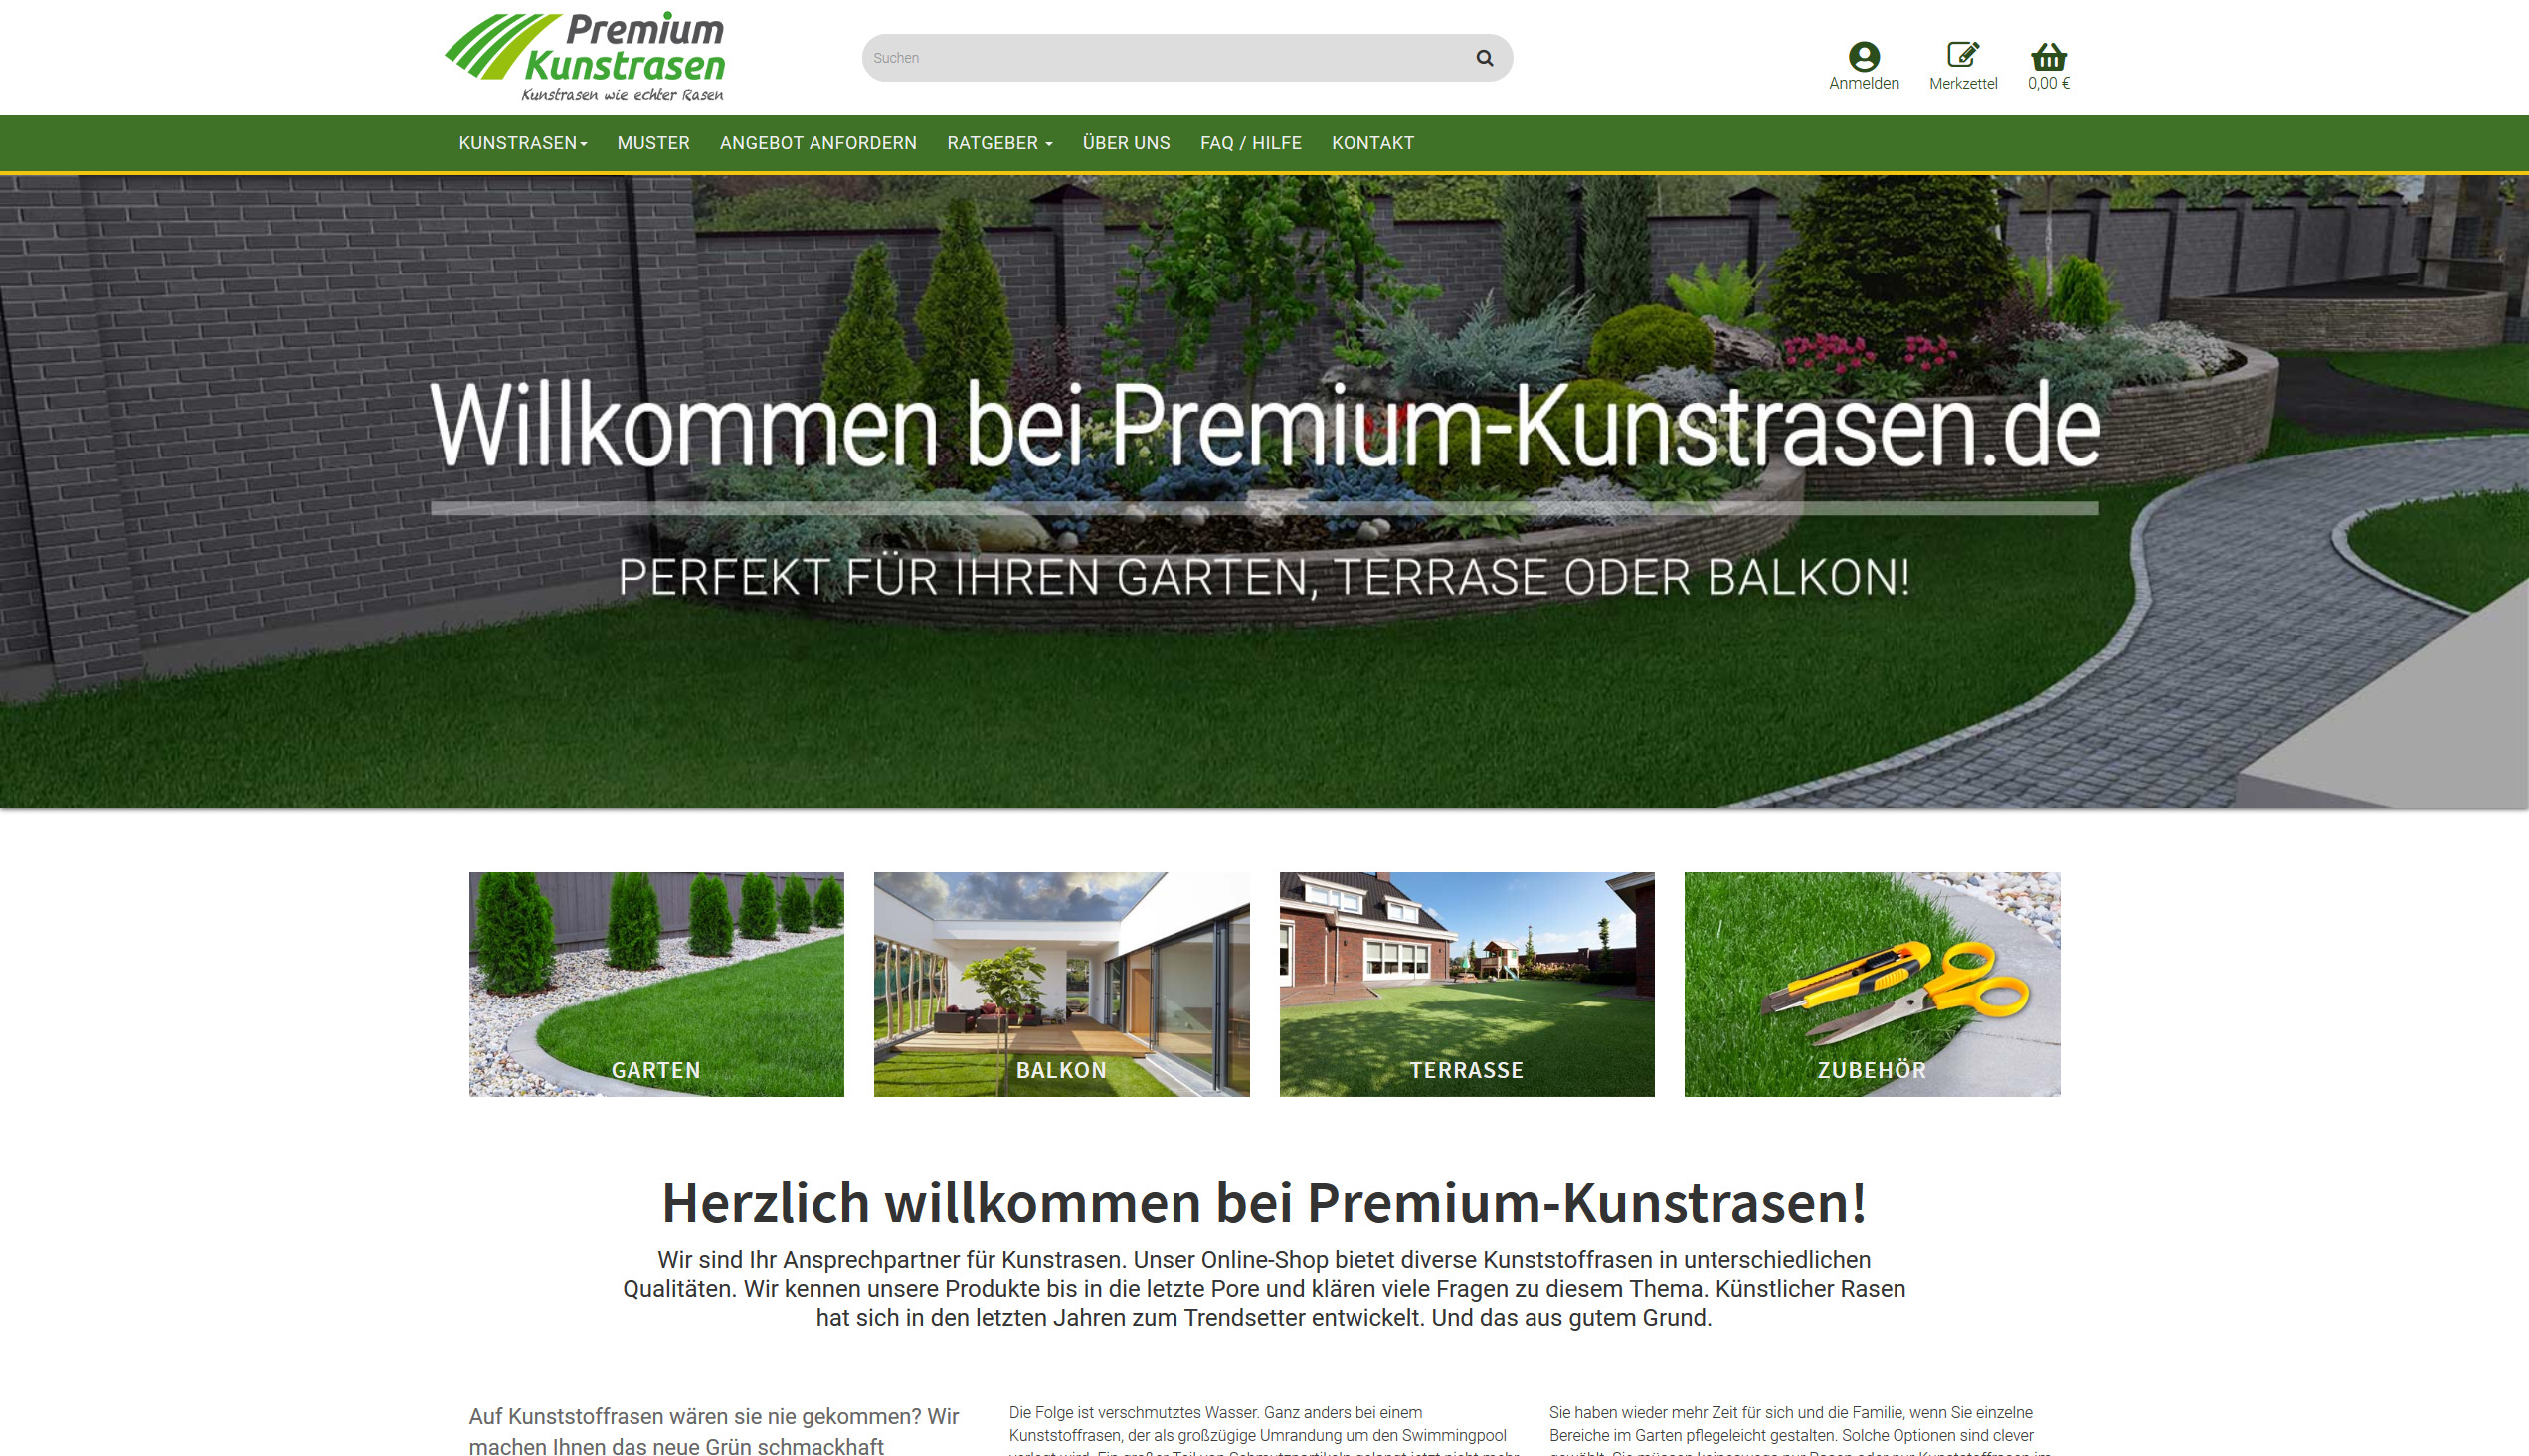 NP Premium Kunstrasen GmbH